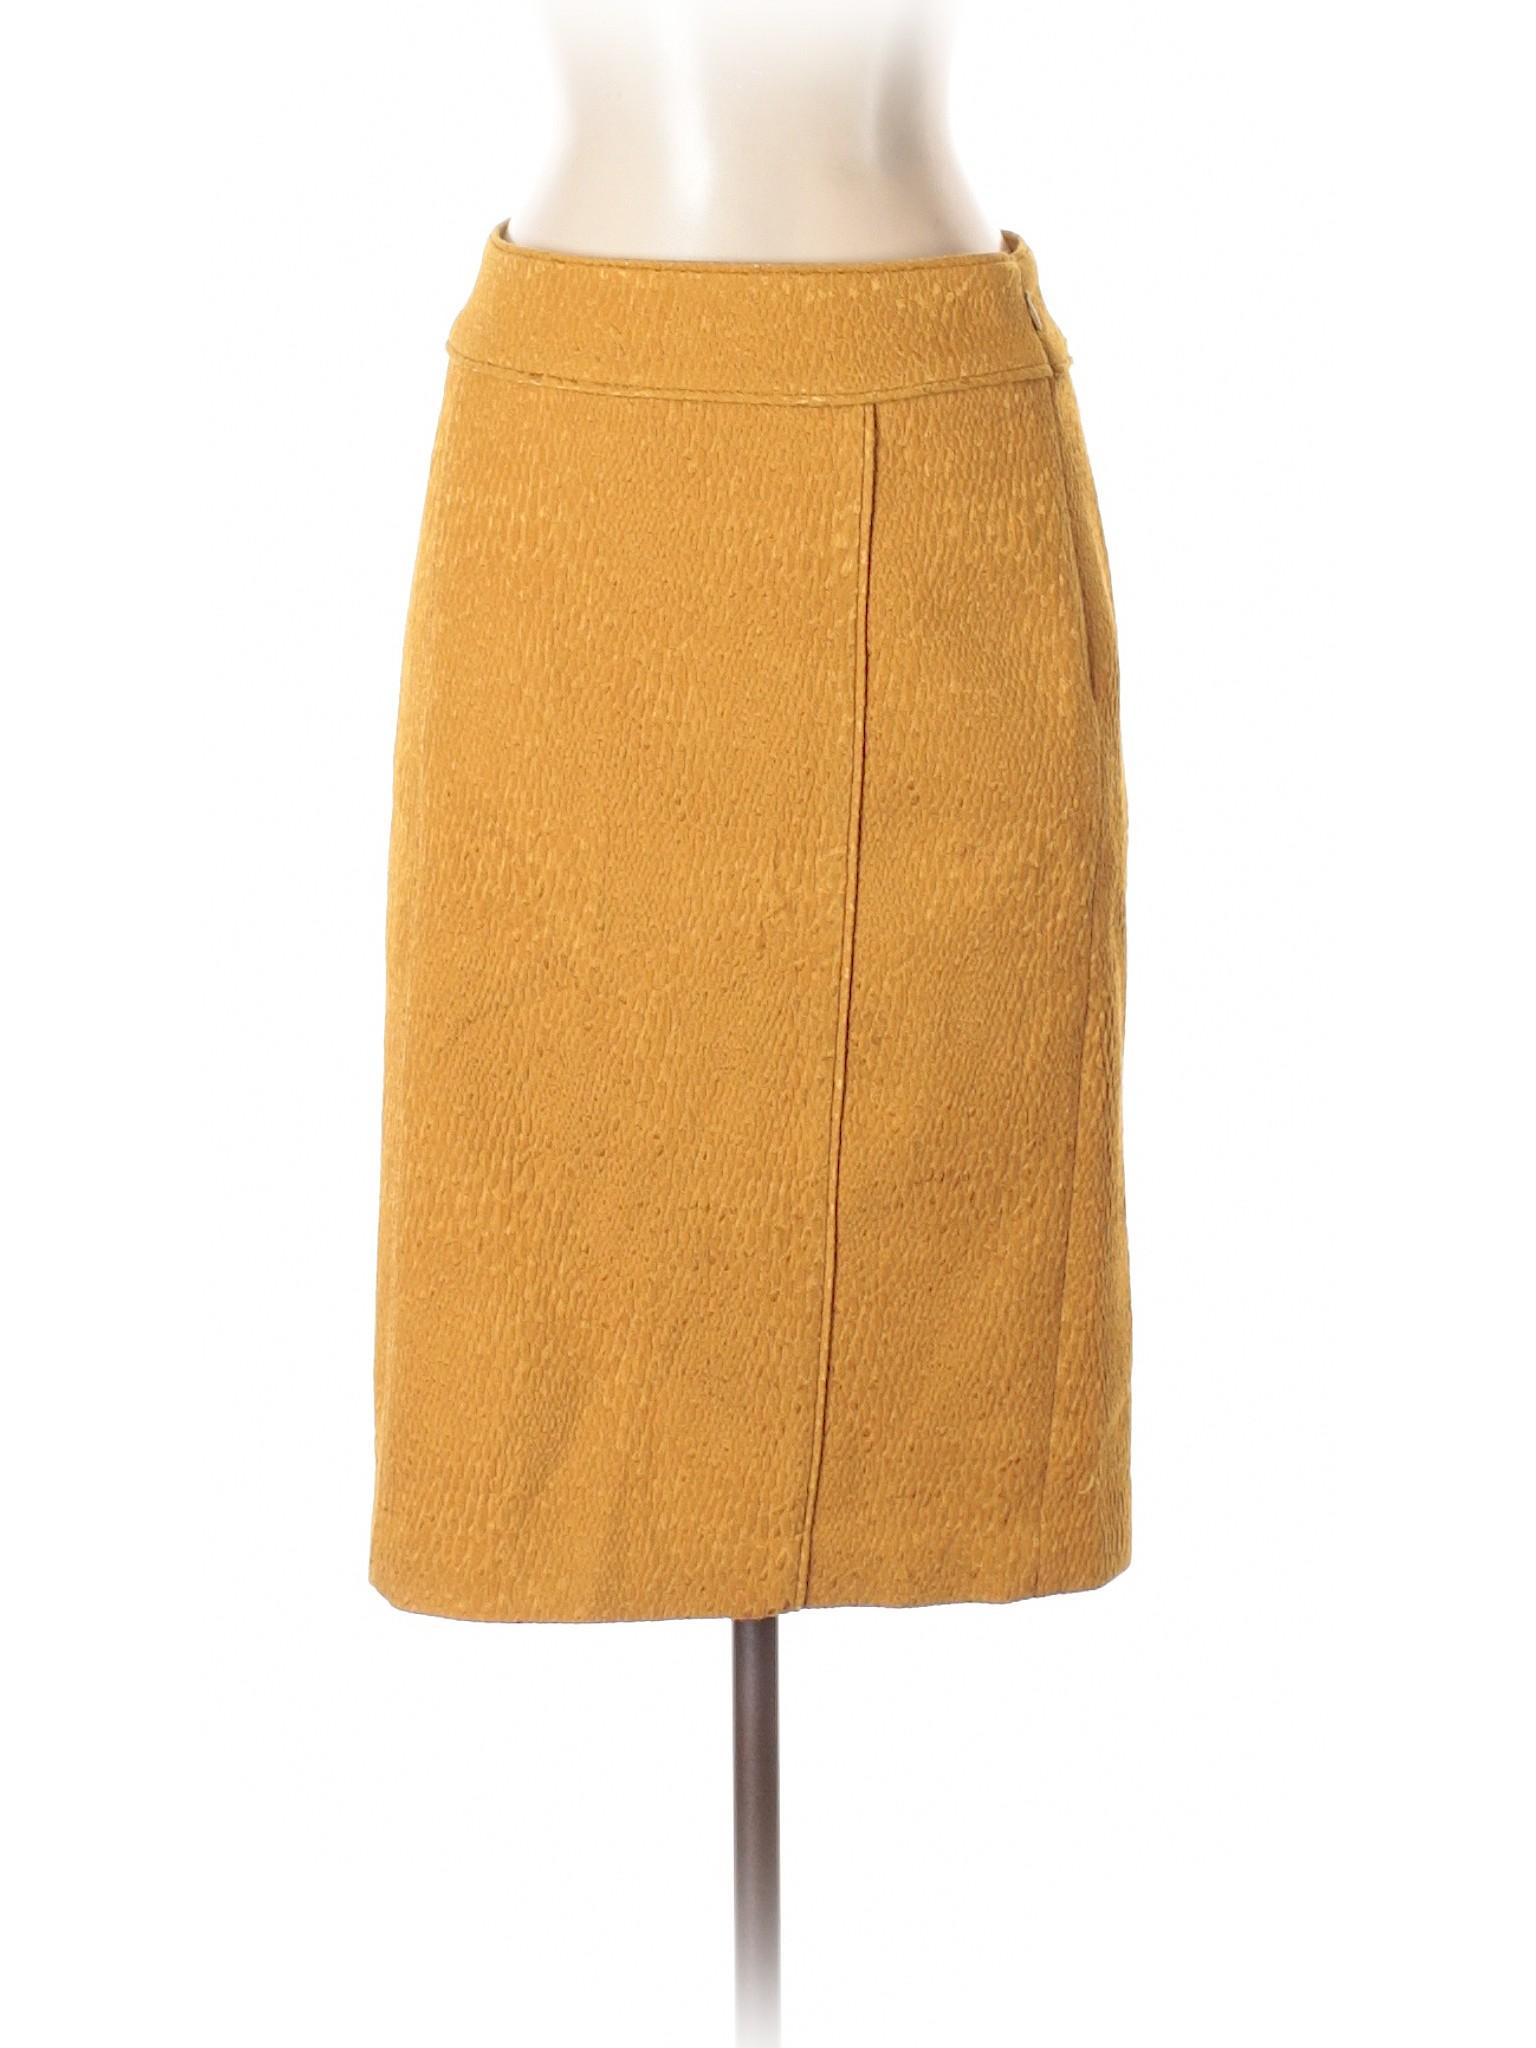 Casual Republic winter Skirt Banana Leisure 1PXYW